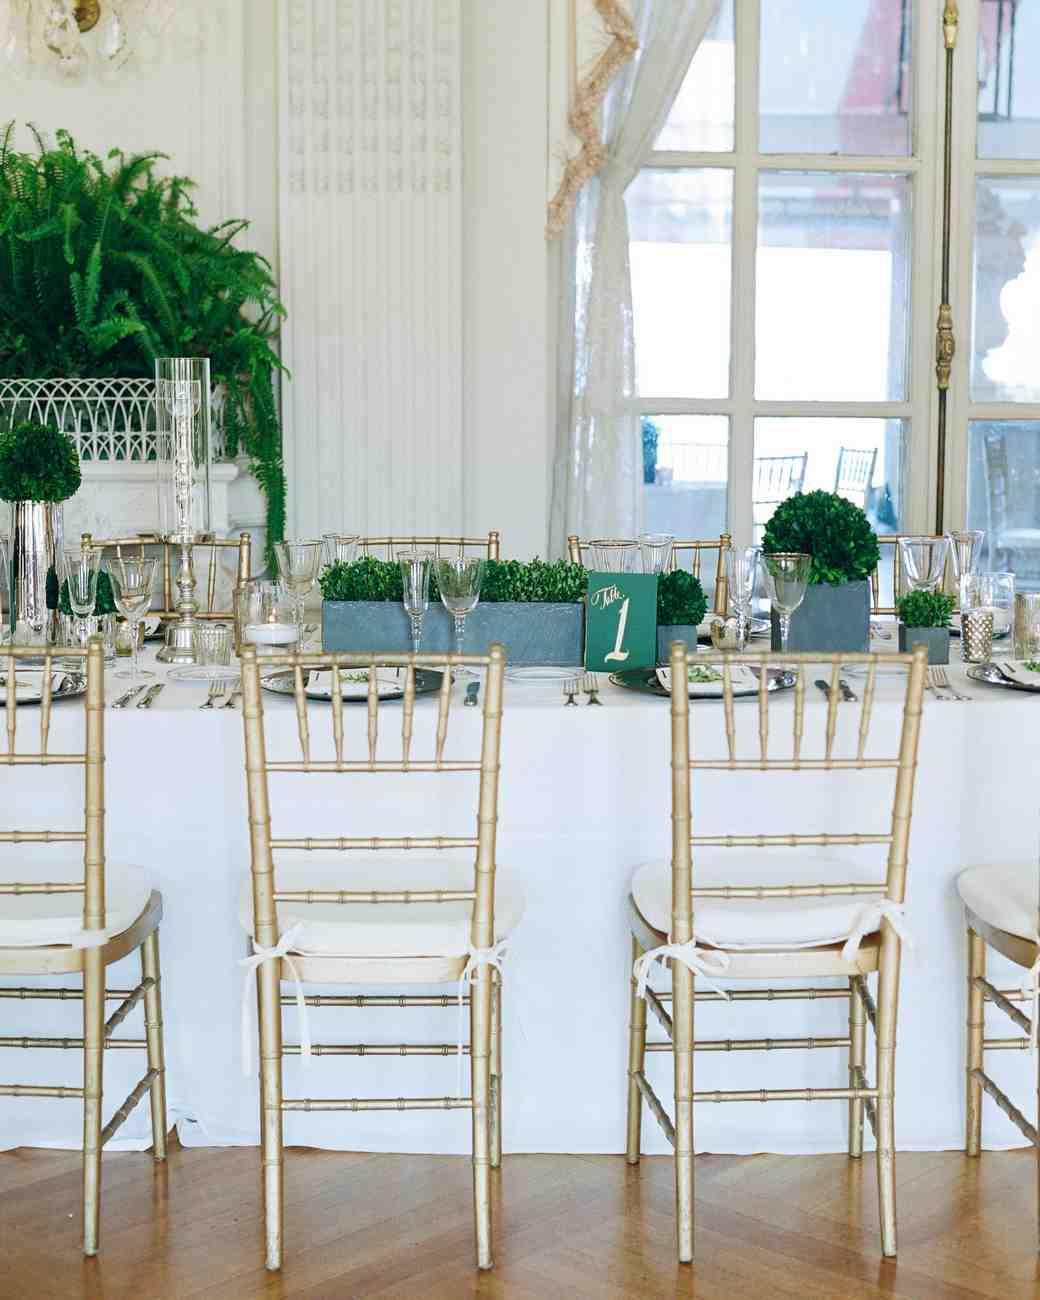 lissy-steven-wedding-newport-table-172-elizabethmessina-s112907-0516.jpg